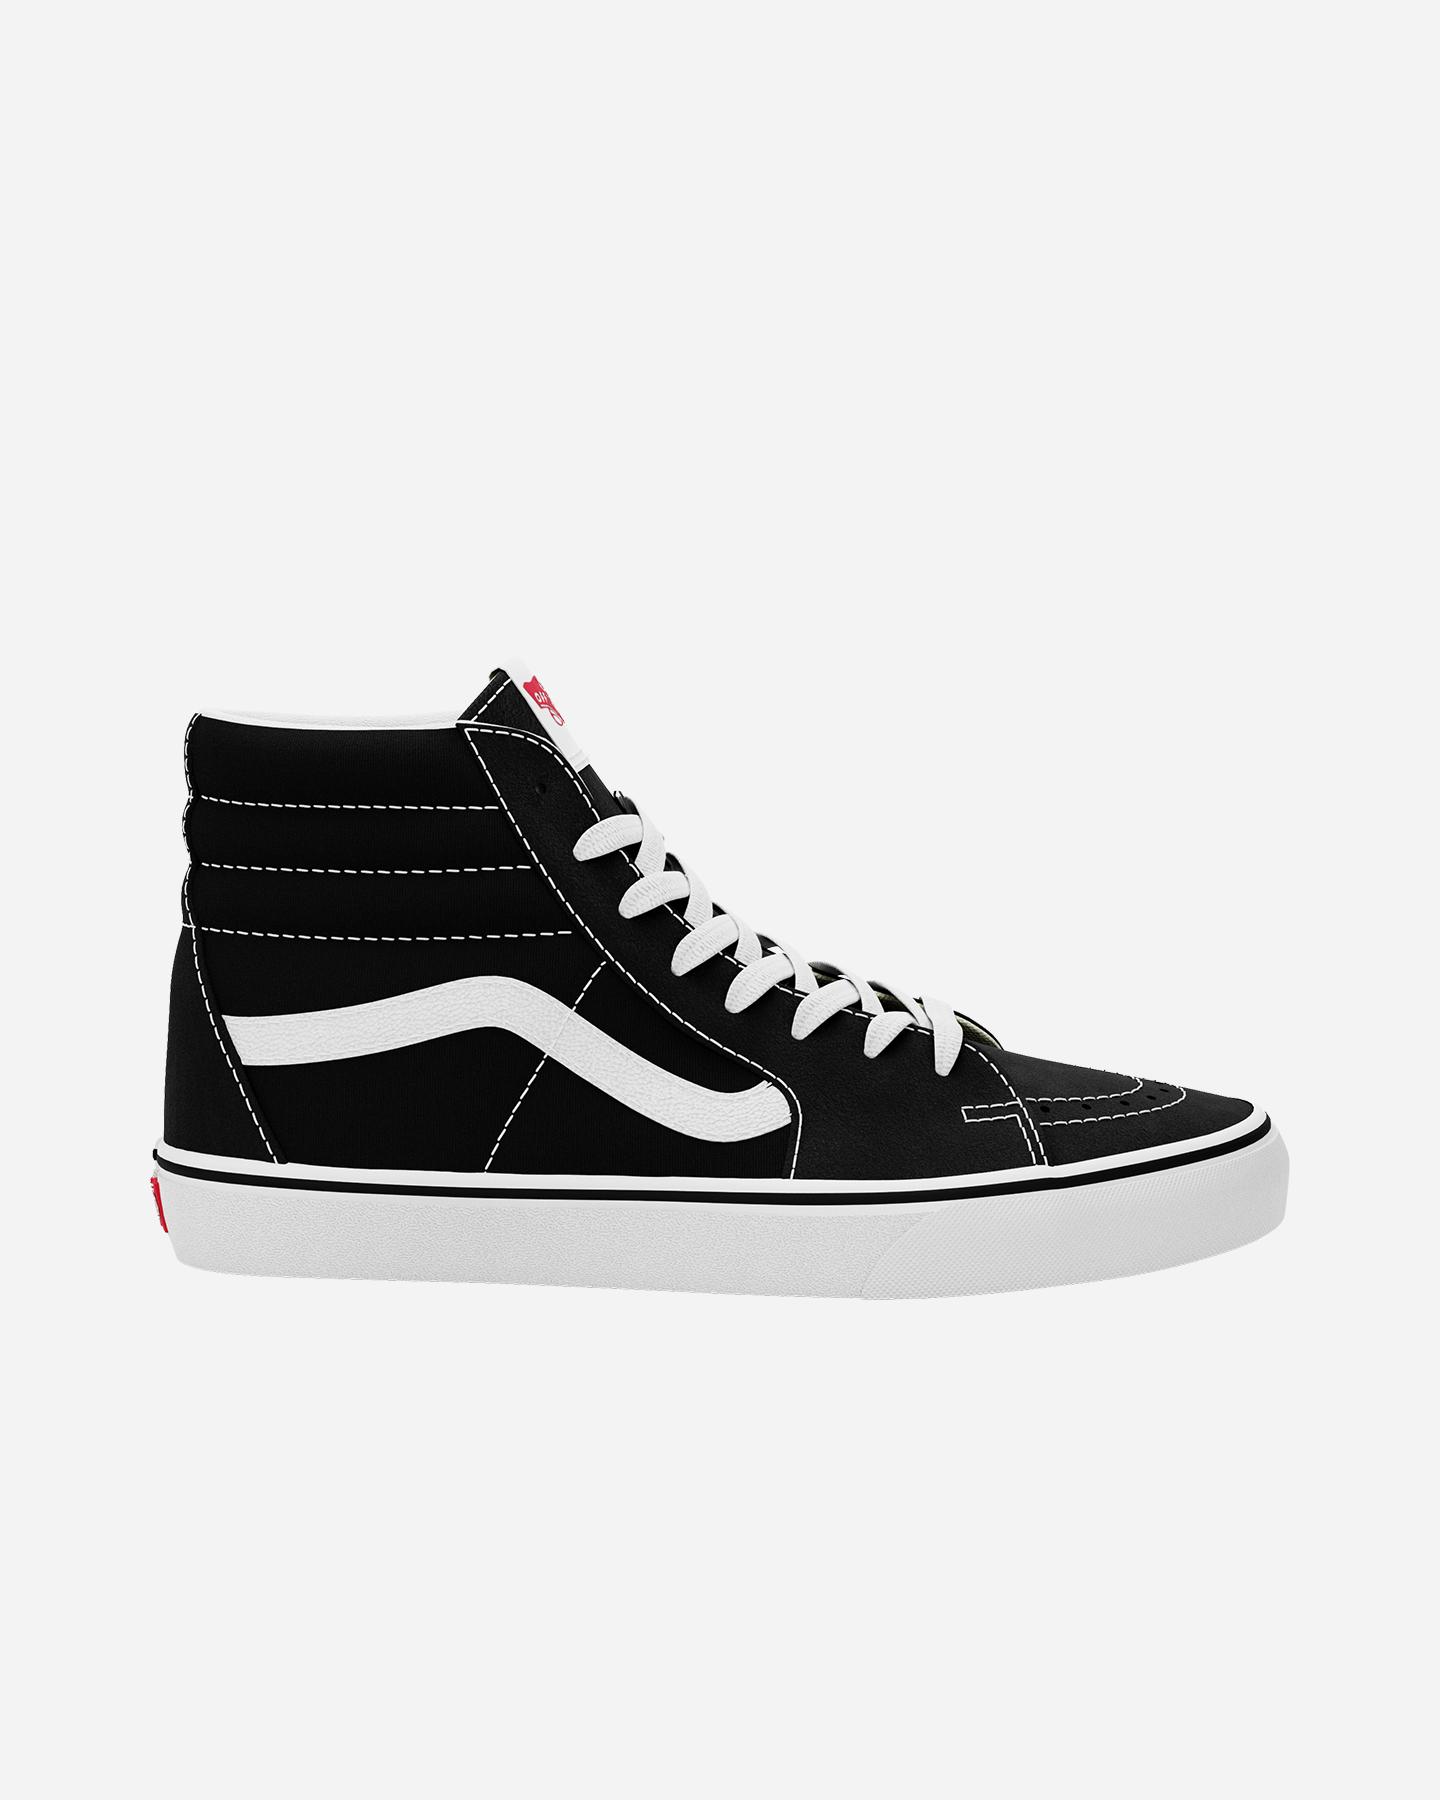 Su Vans Cisalfa M Sport Sneakers Lite Hi Vn000d5ib8c1 Scarpe Sk8 nWPxSrn